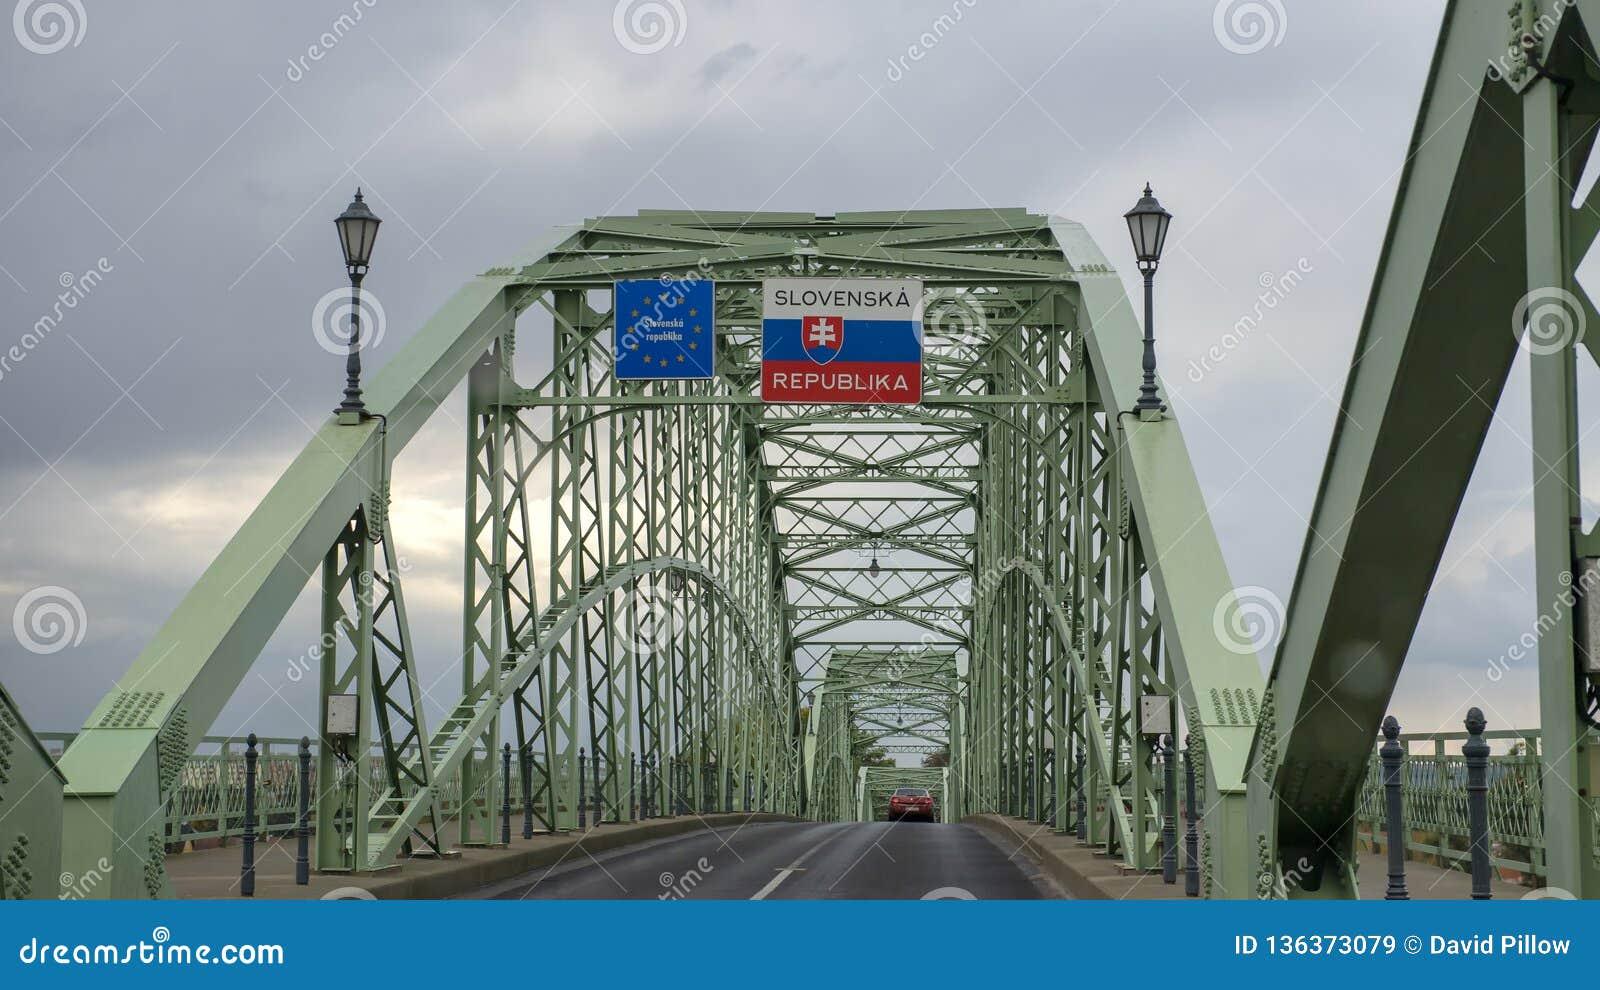 The Maria Valeria bridge joining Esztergom in Hungary and Sturovo in Slovakia, across the River Danube